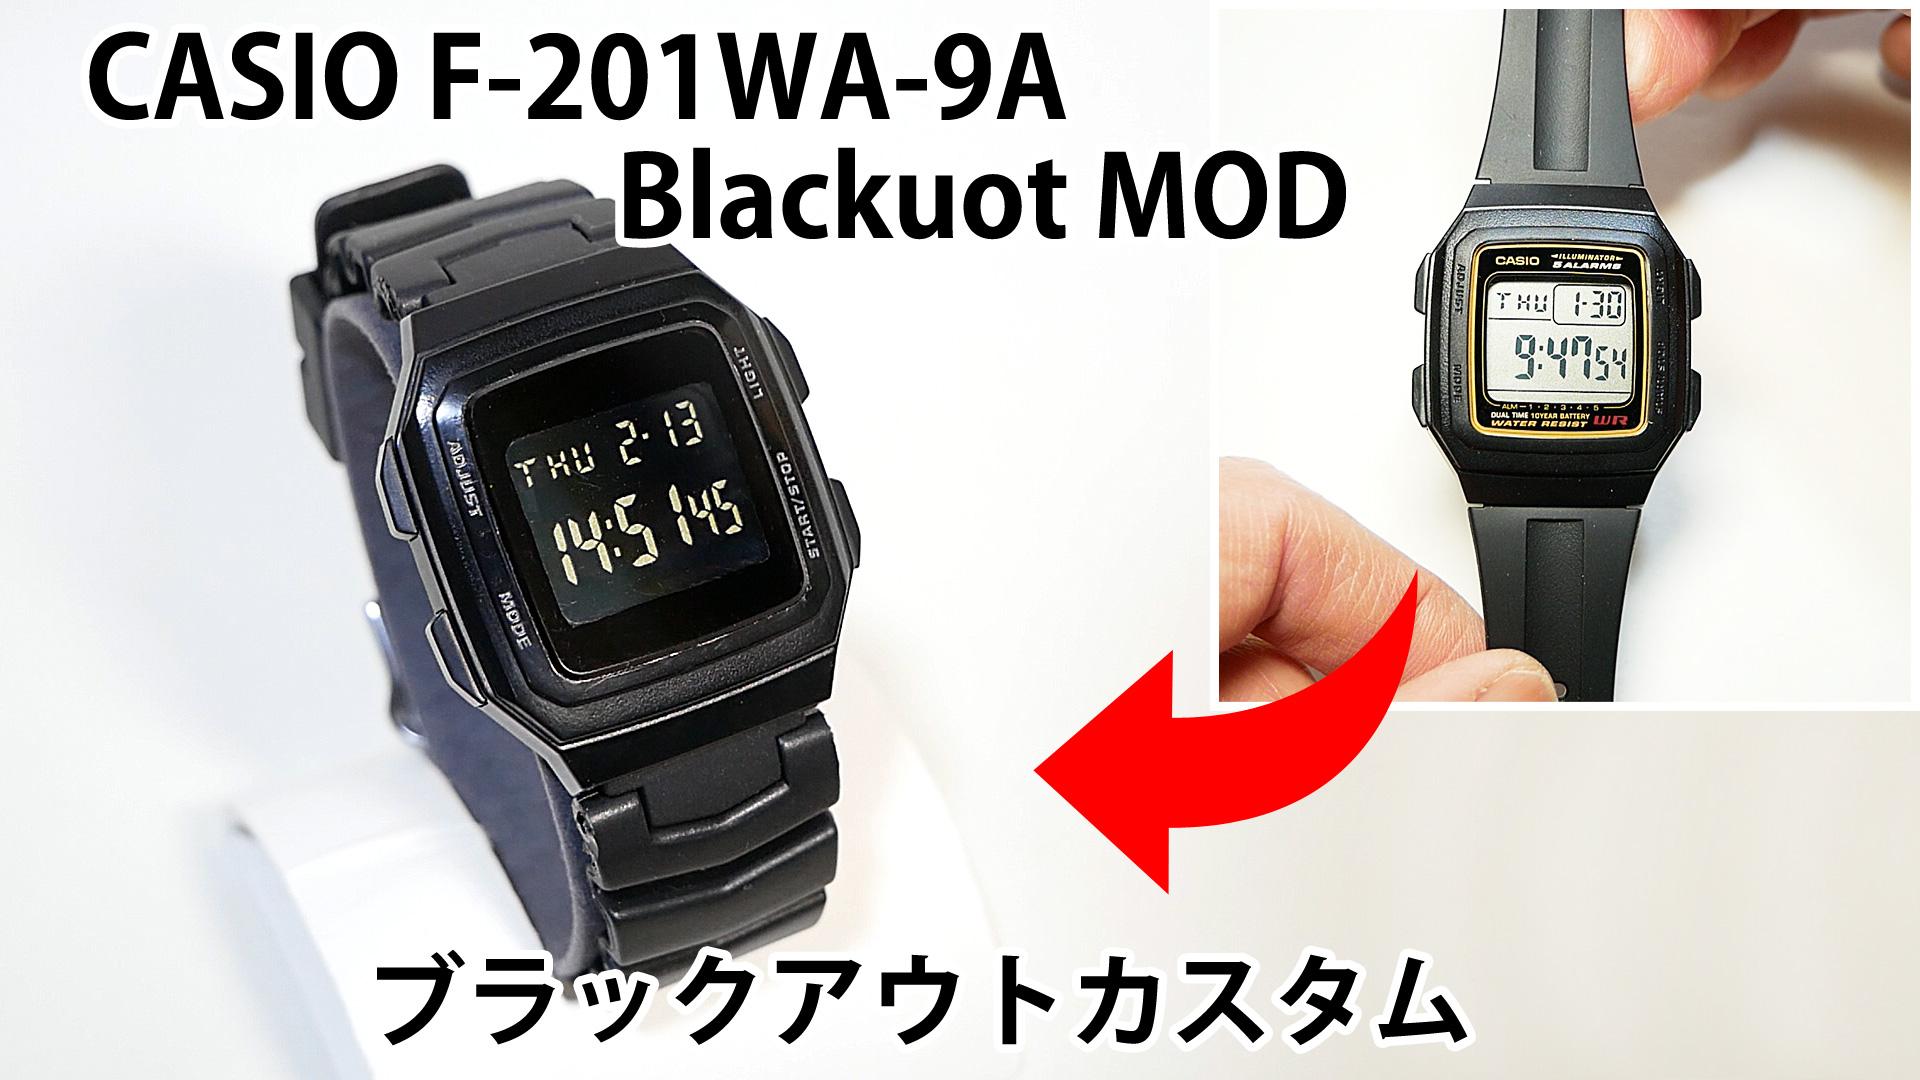 CASIO F-201WA-9A Blackout MOD